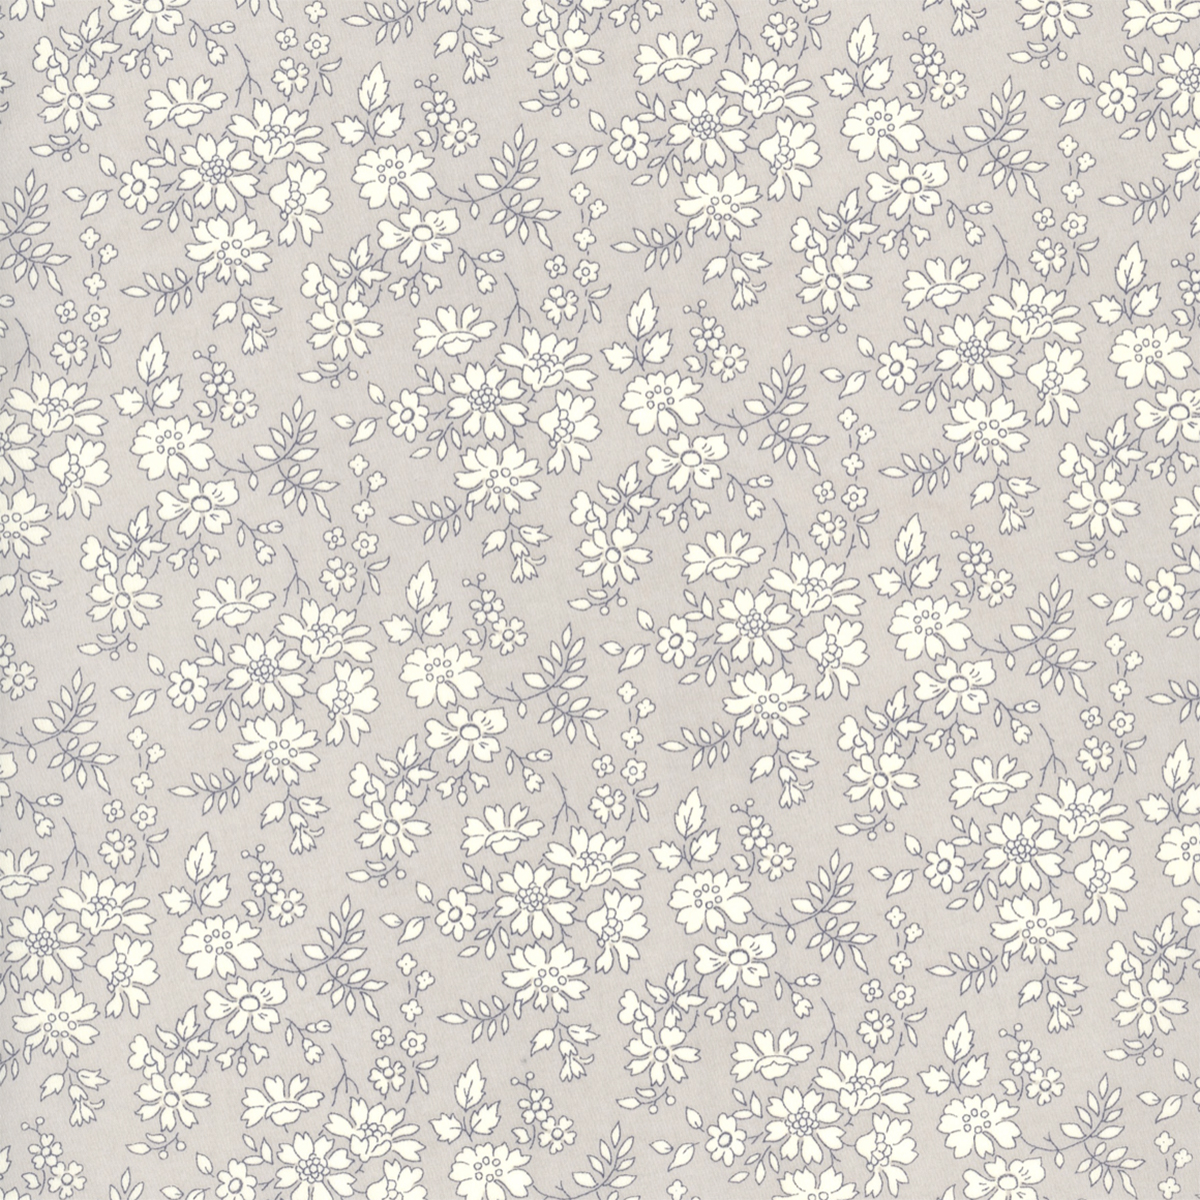 Amy Kallissa - Add It Up - Polar - Ruby Star Society Fabric